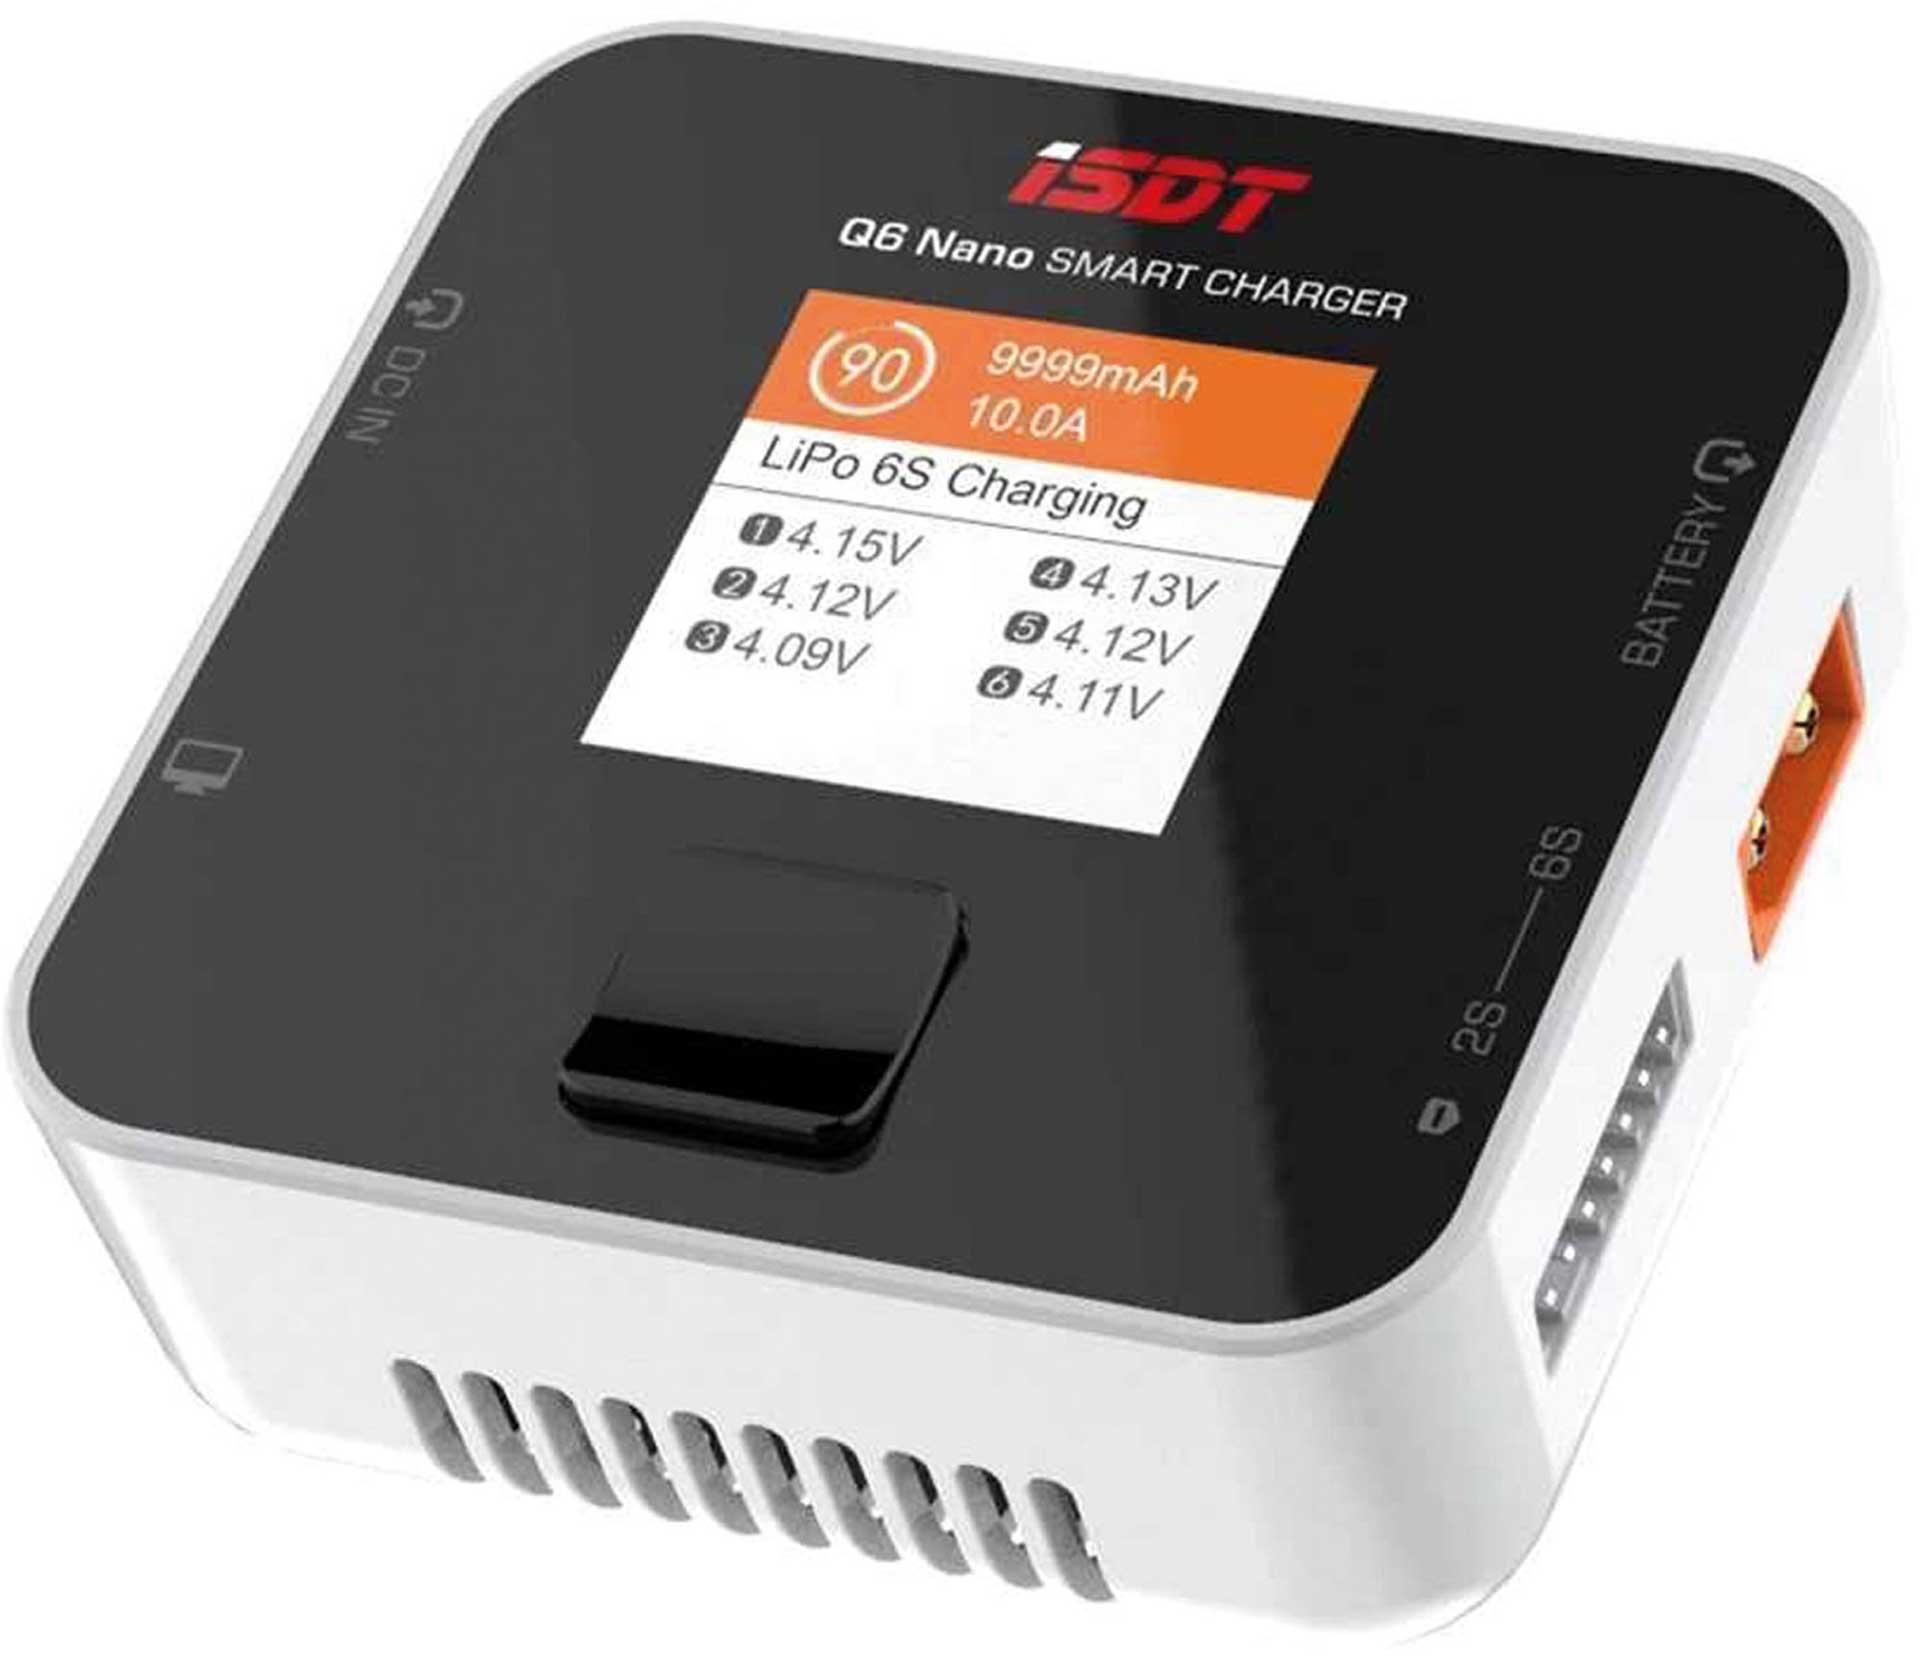 ISDT Q6 NANO SMART CHARGER 200W 1-6S -8A Ladegerät